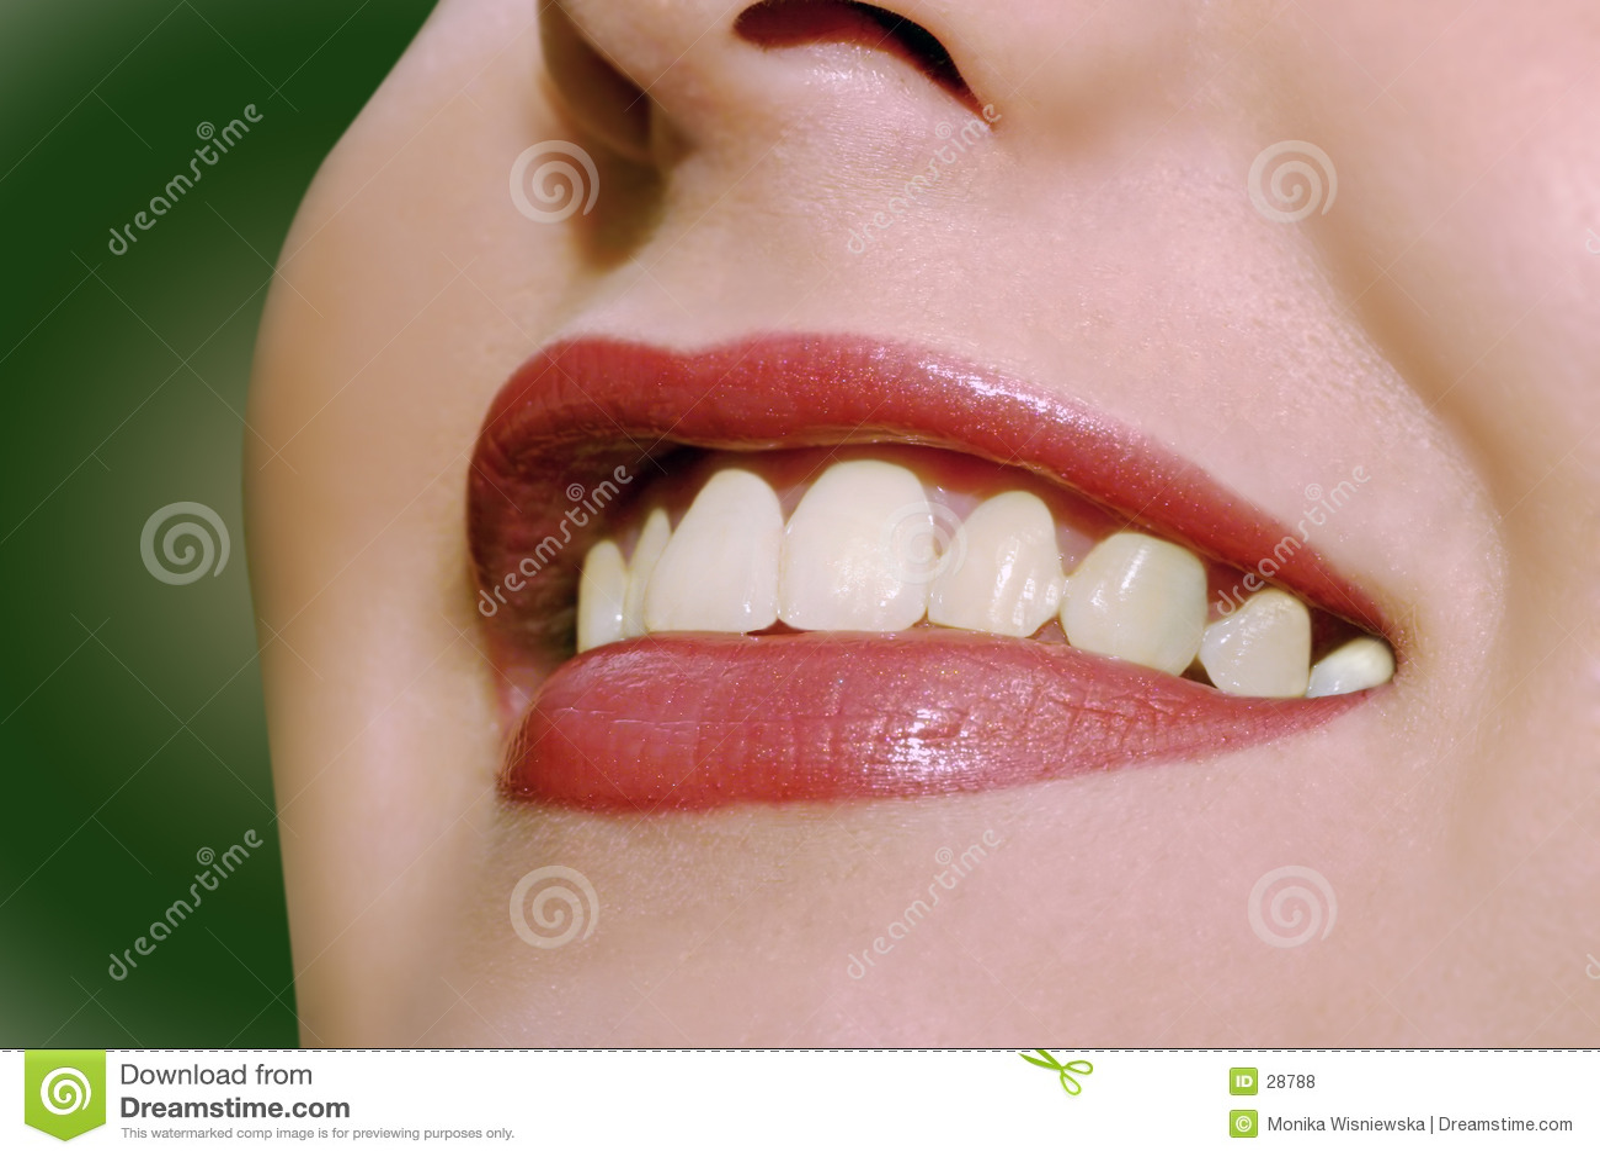 Lippen - so glücklich!